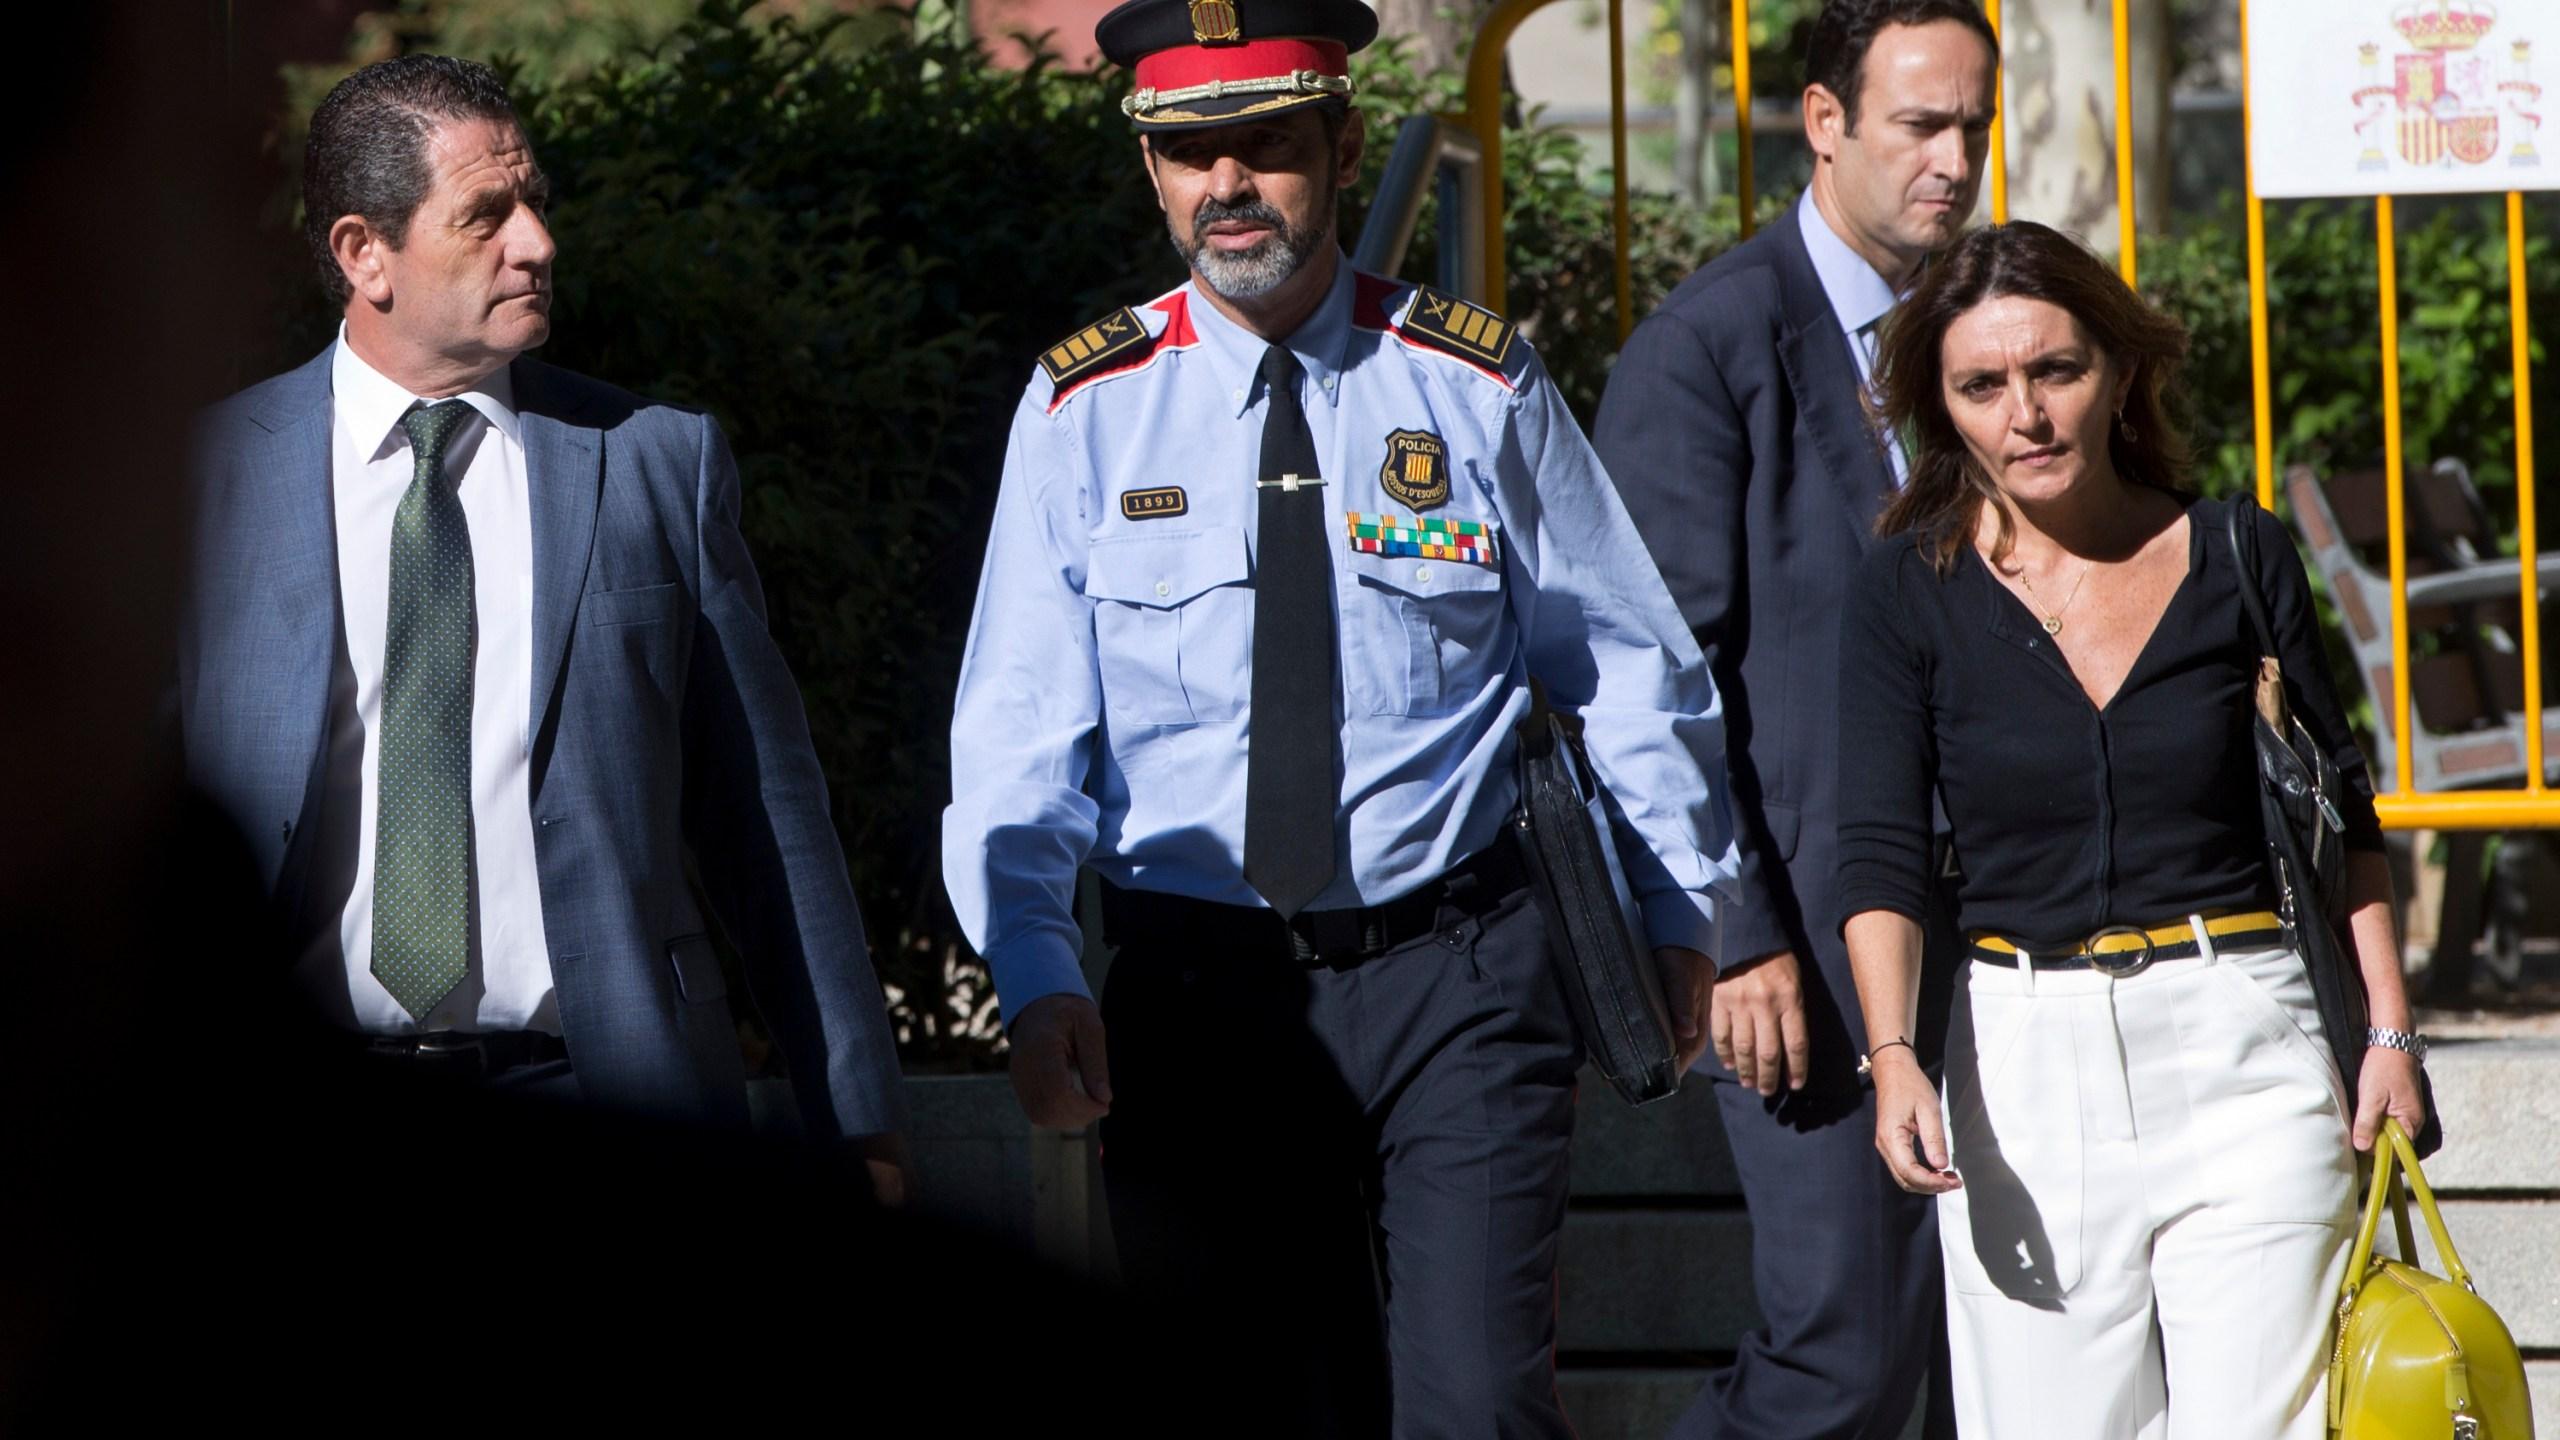 Josep Lluis Trapero, Josep Luis Trapero